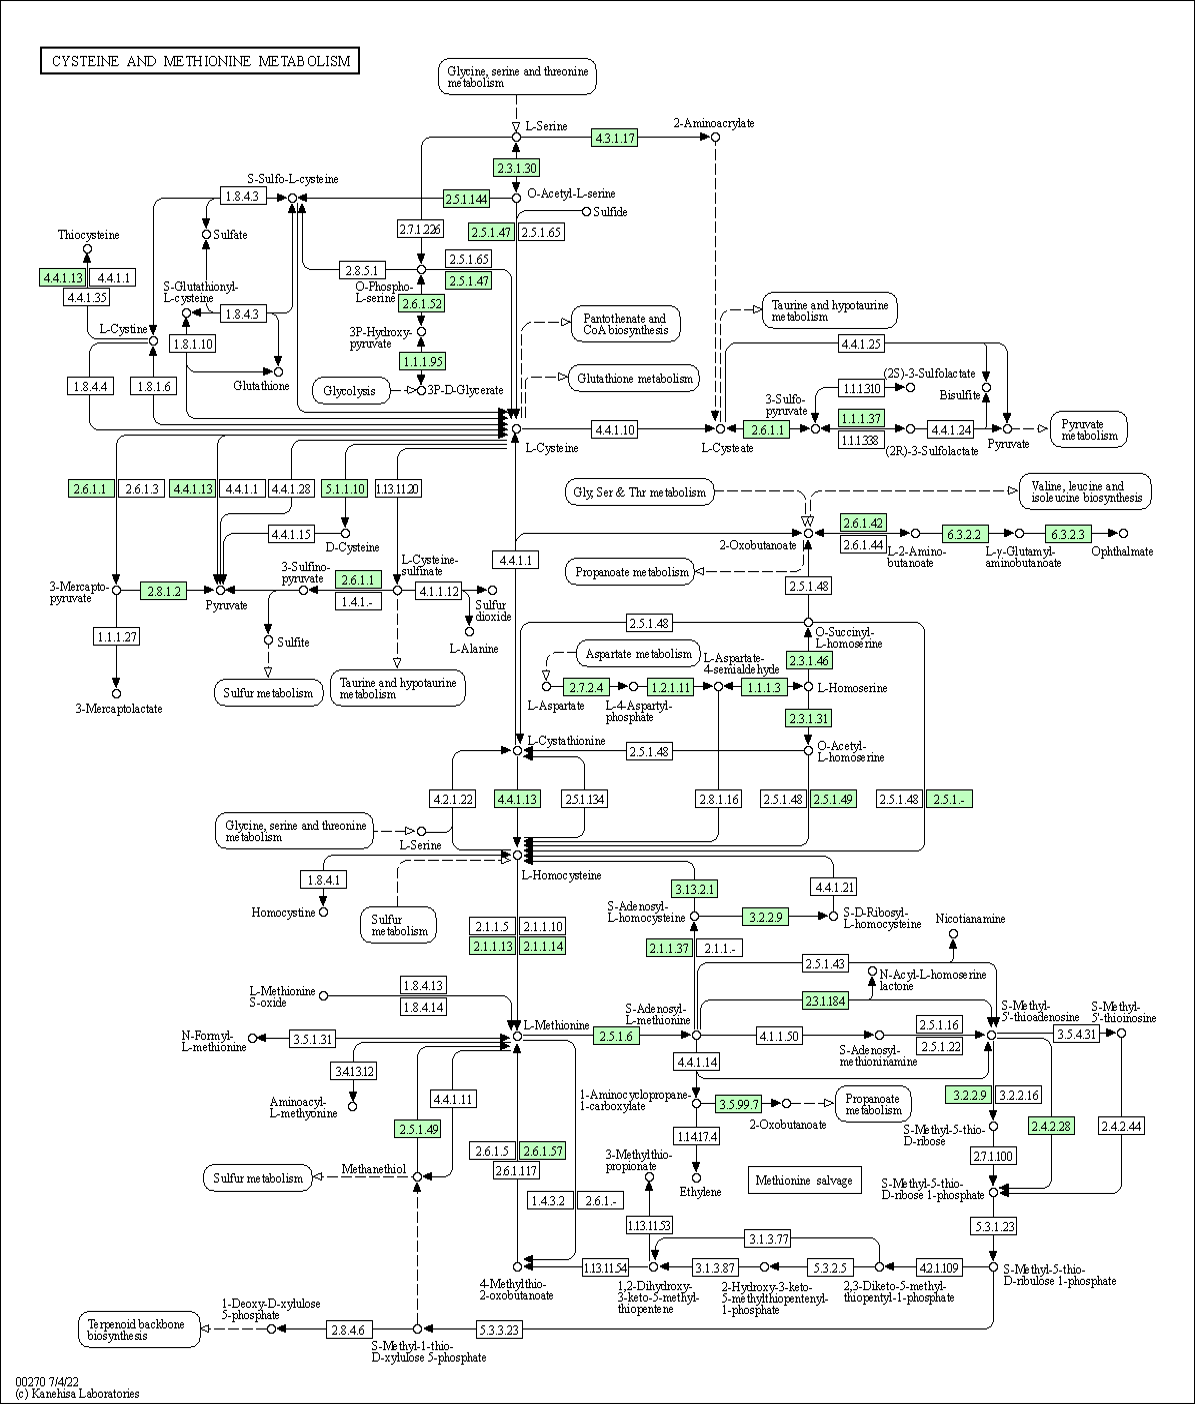 KEGG PATHWAY: Cysteine and methionine metabolism ... on